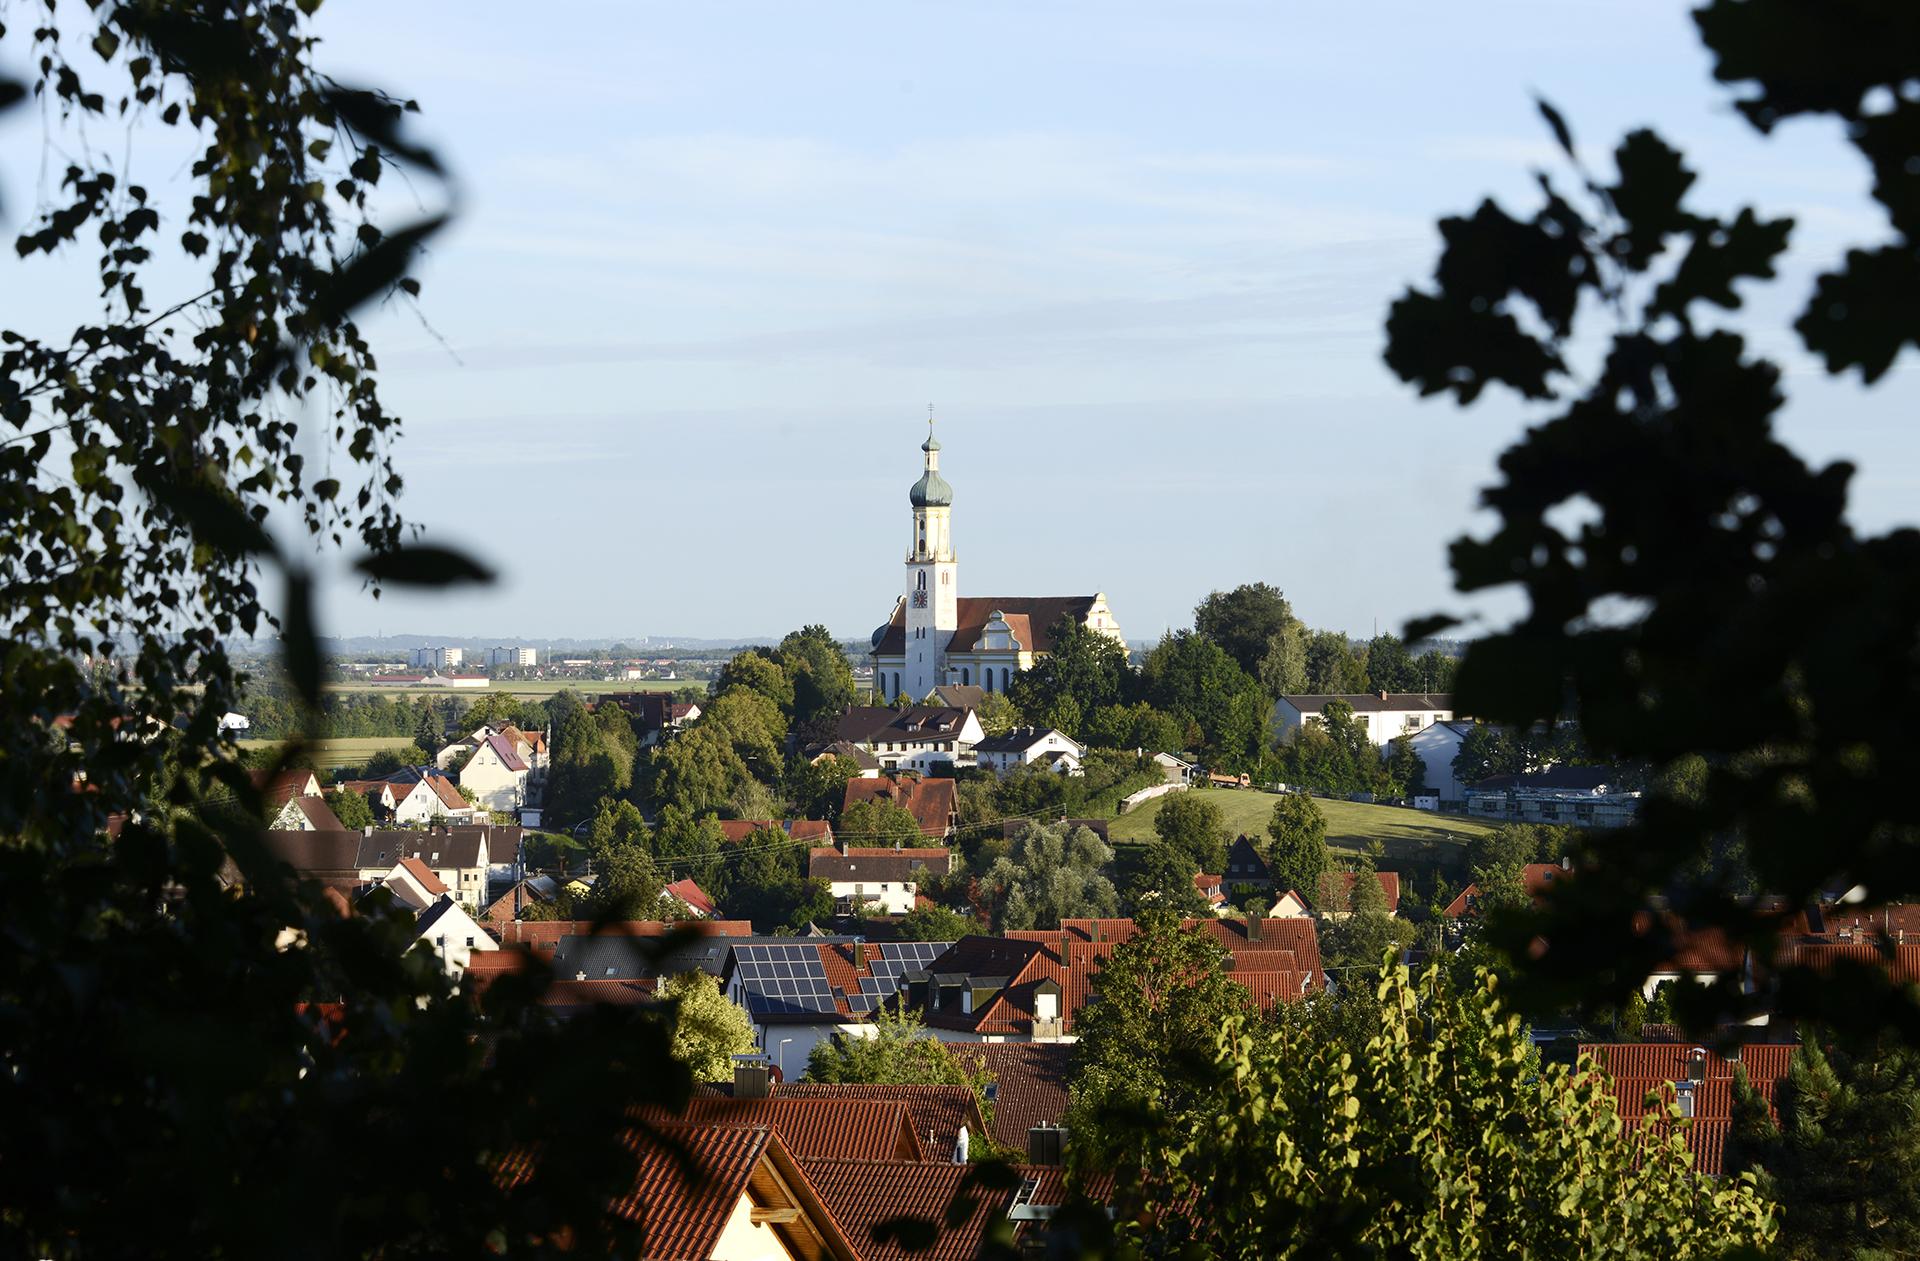 Ortsbild Biberbach